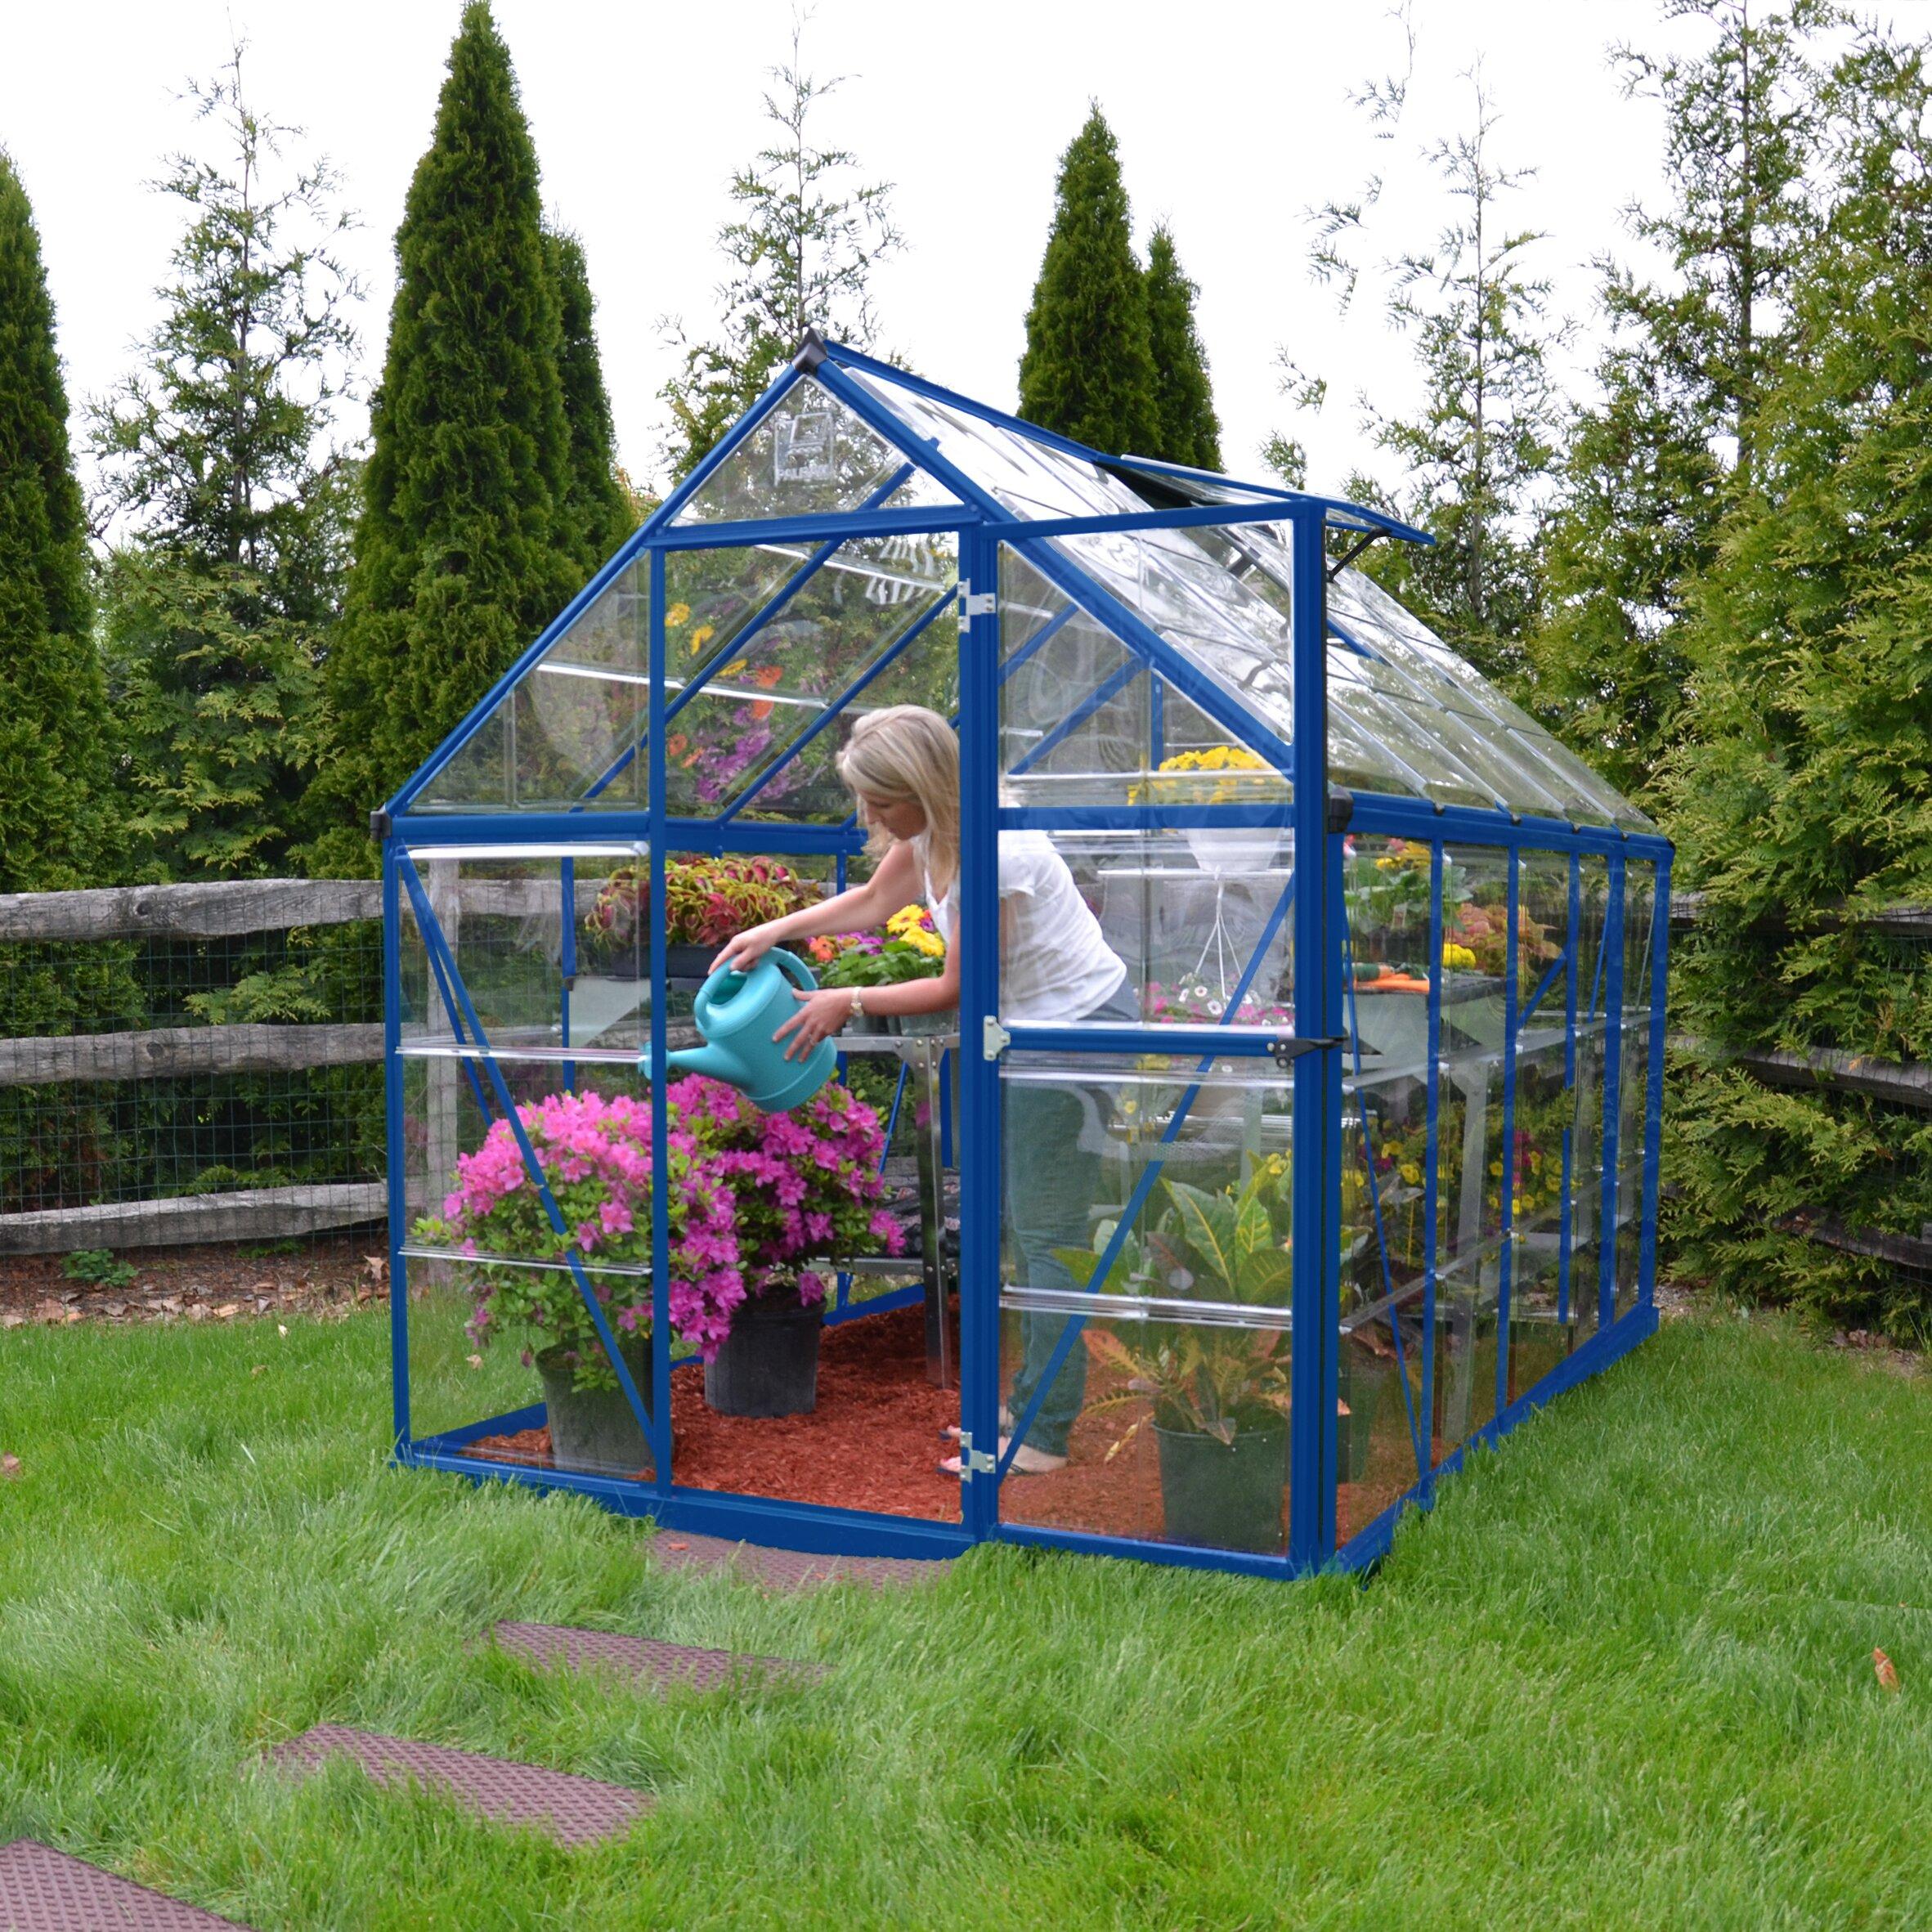 Palram Harmony 6 Ft. X 10 Ft. Greenhouse